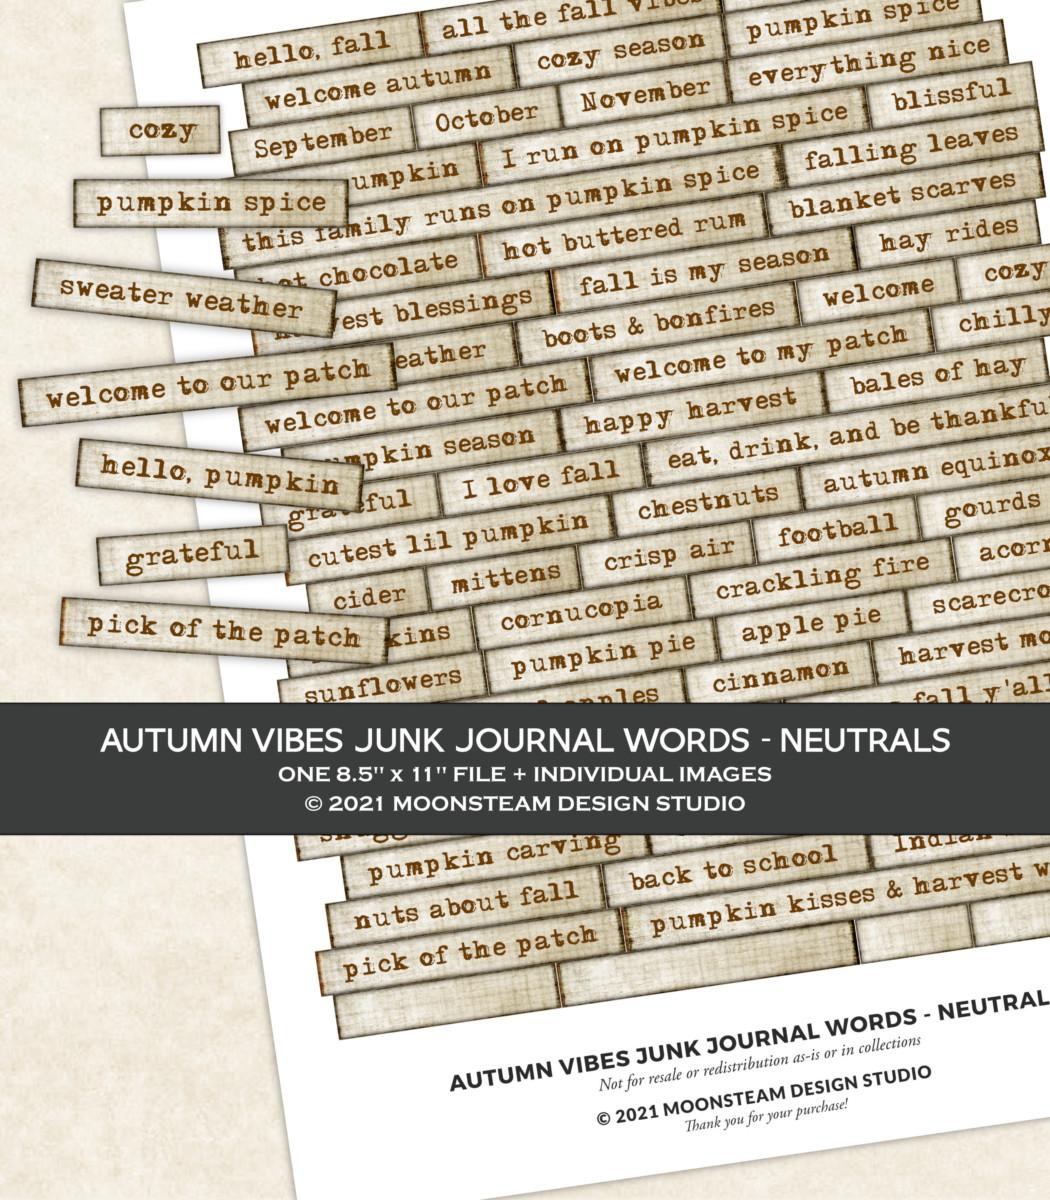 Autumn Vibes Journal Words in Neutral by Moonsteam Design Studio